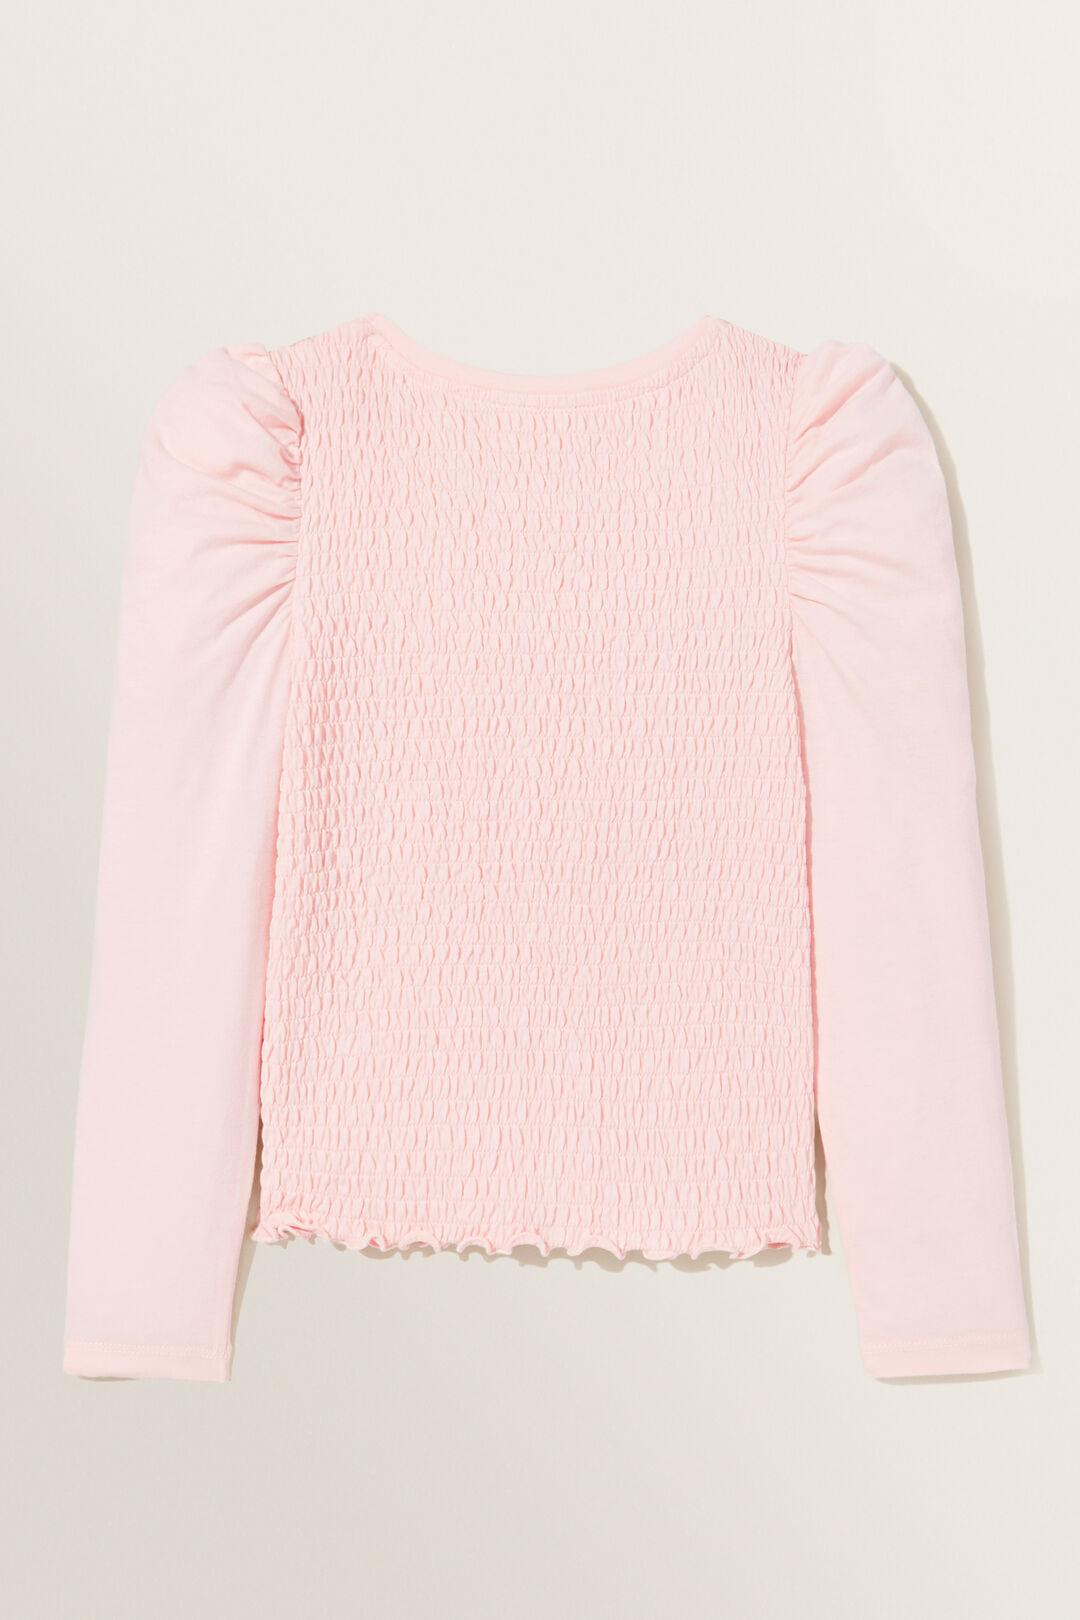 Shirred Long Sleeve Tee  DUSTY ROSE  hi-res